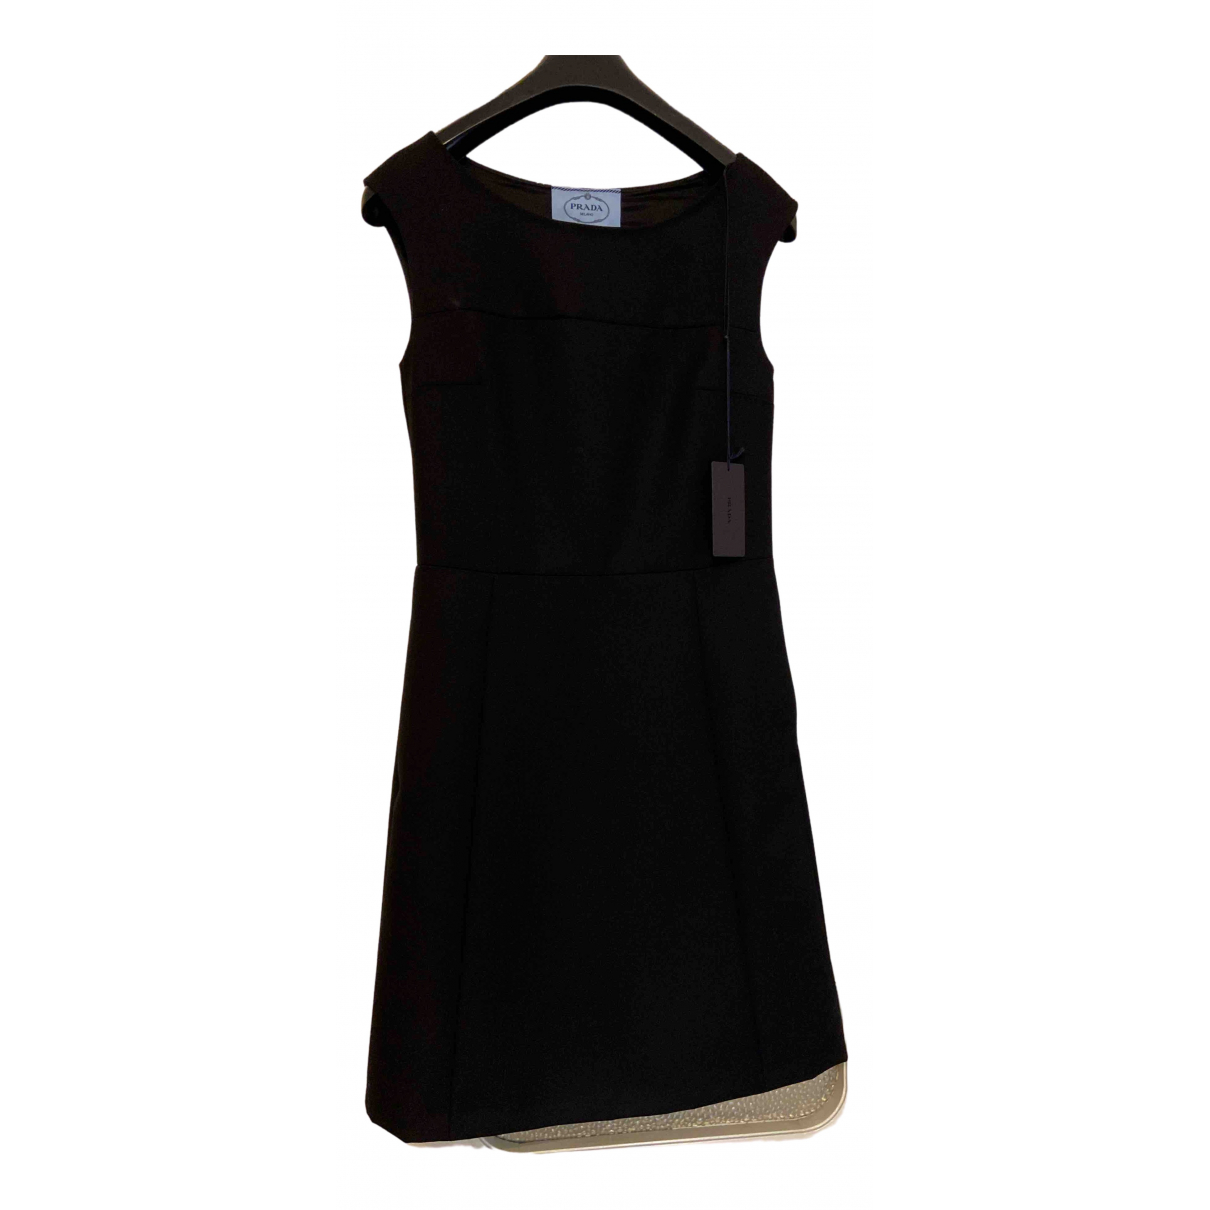 Prada \N Black Wool dress for Women 36 IT